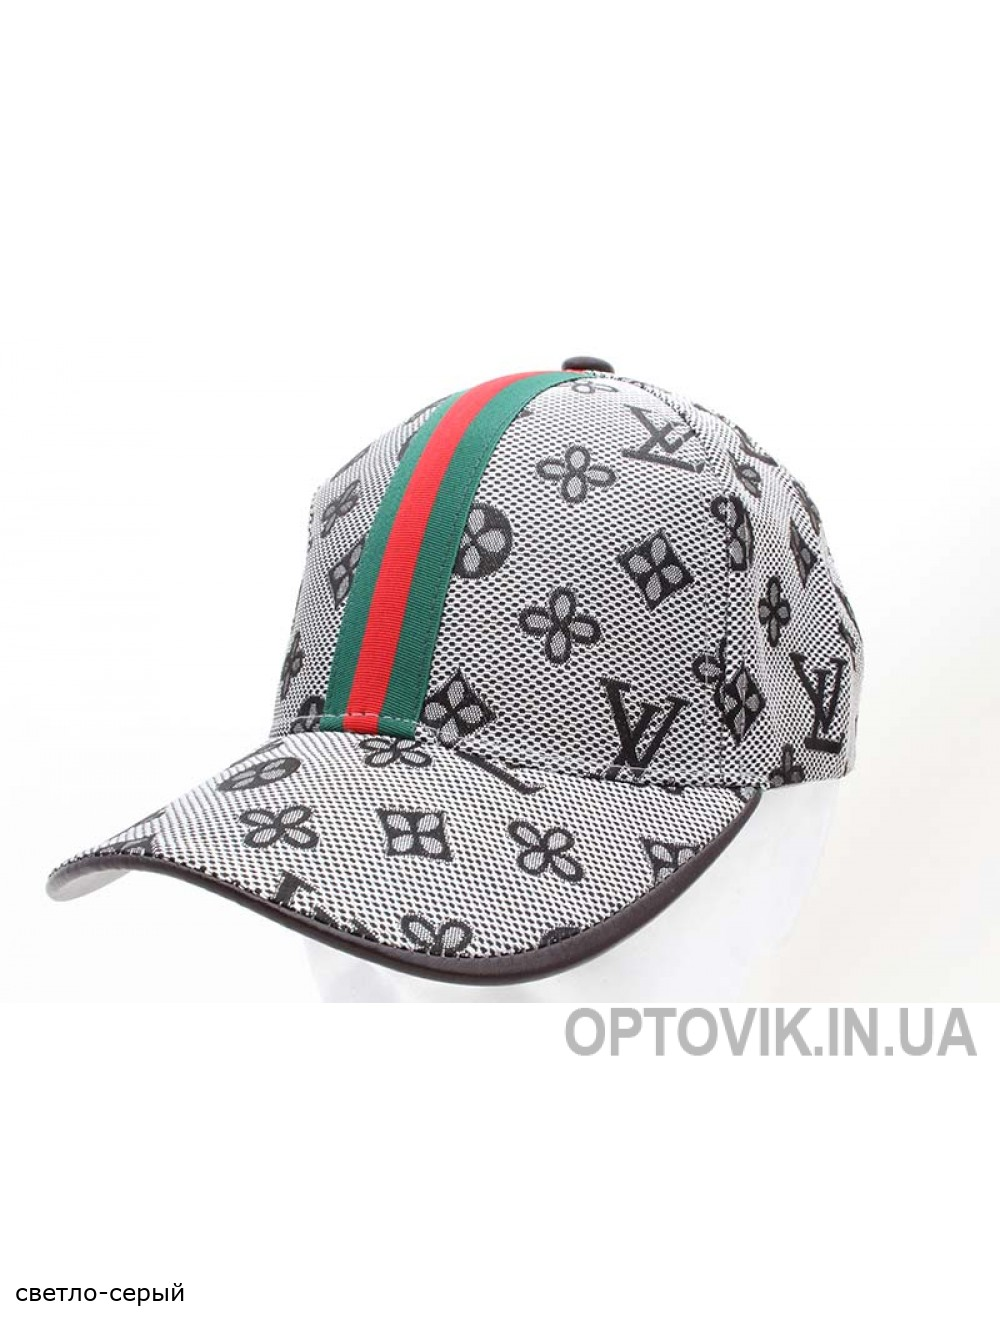 Brand - sp03230